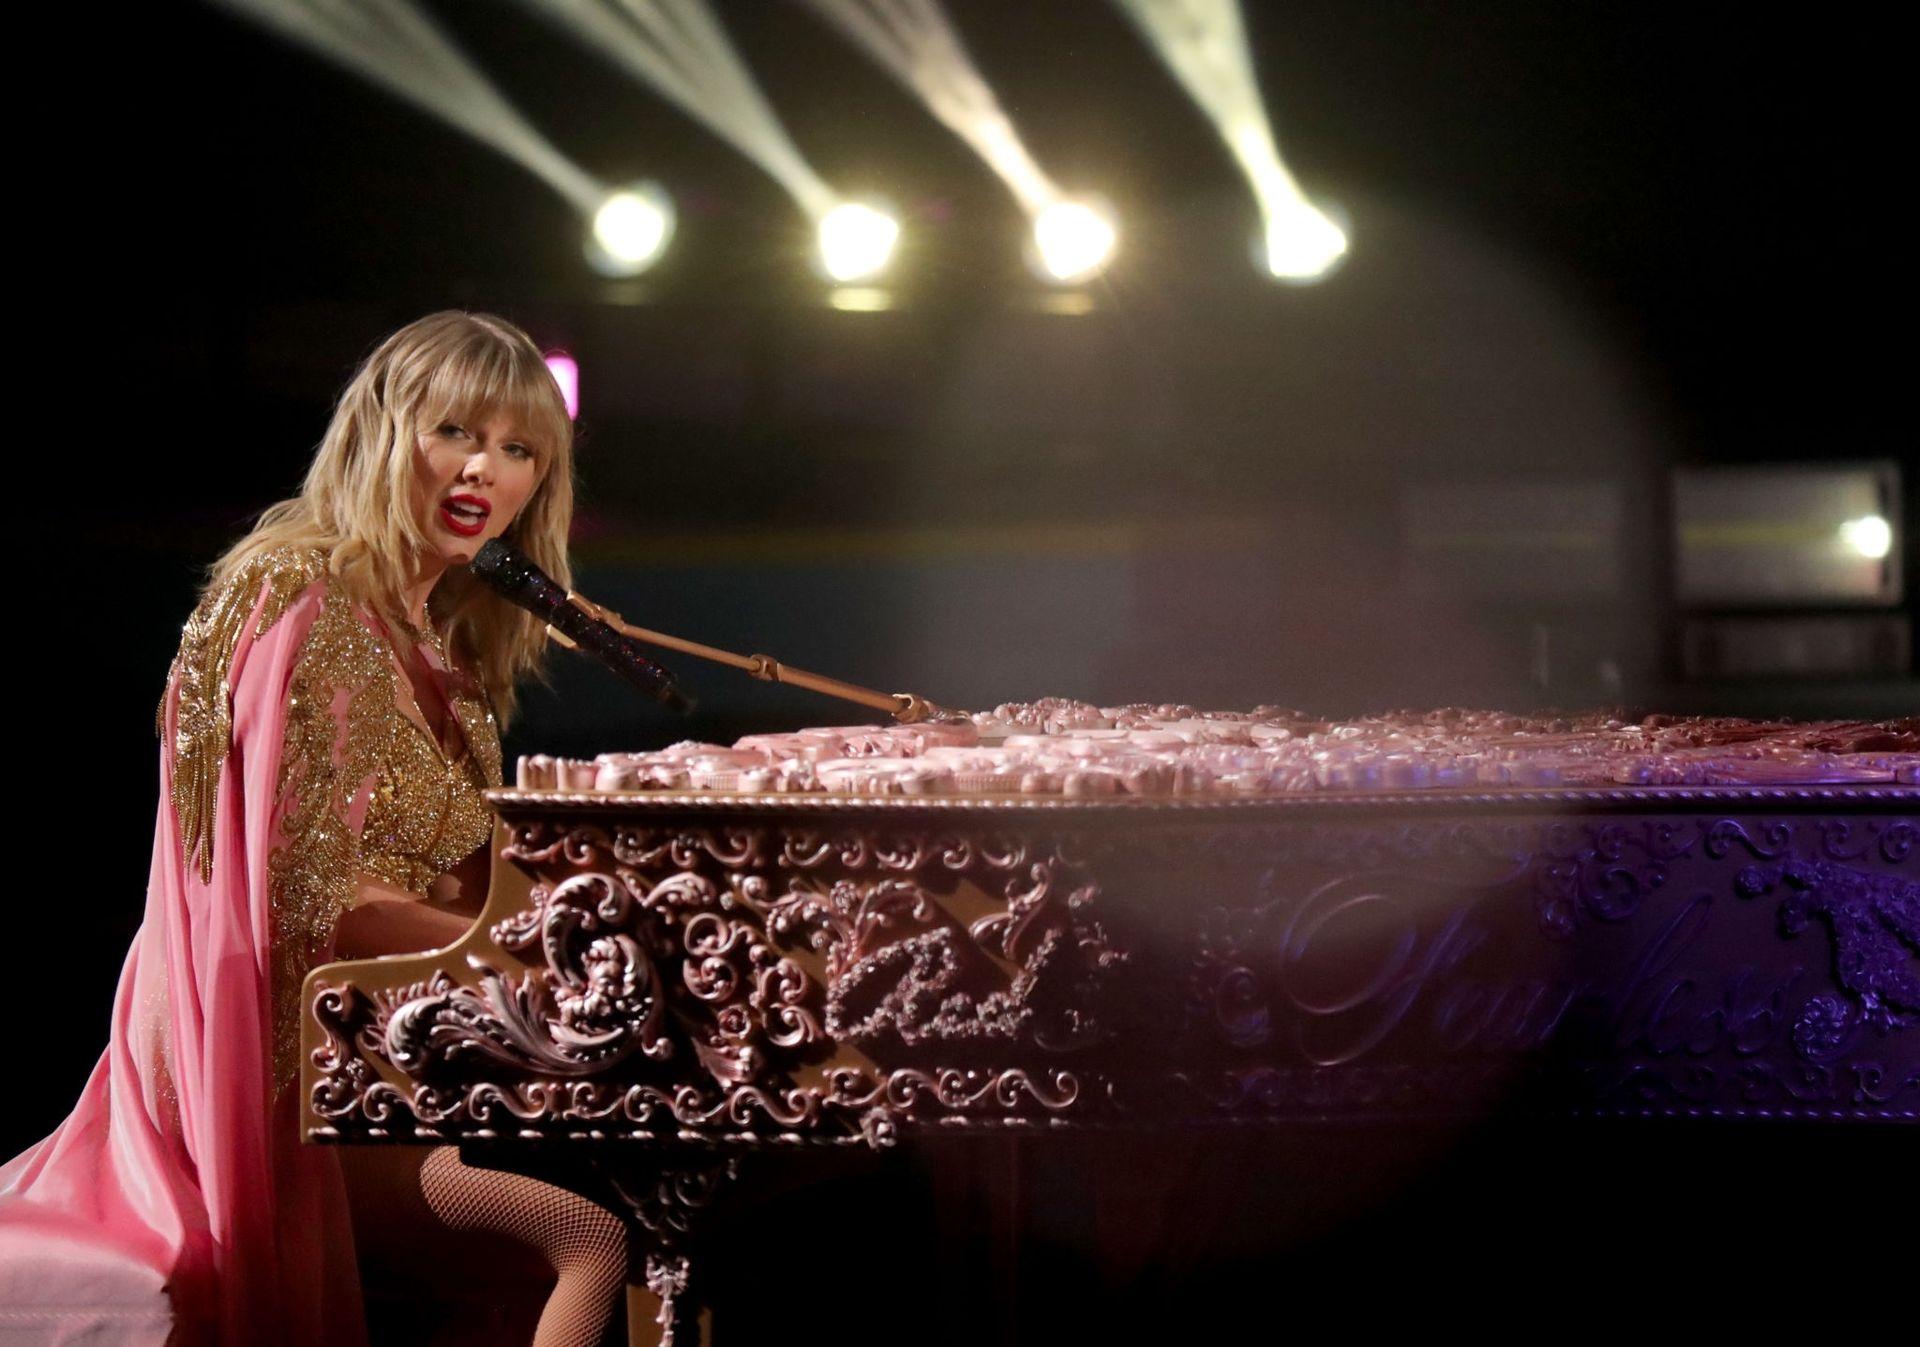 Taylor Swift Sexy 0122